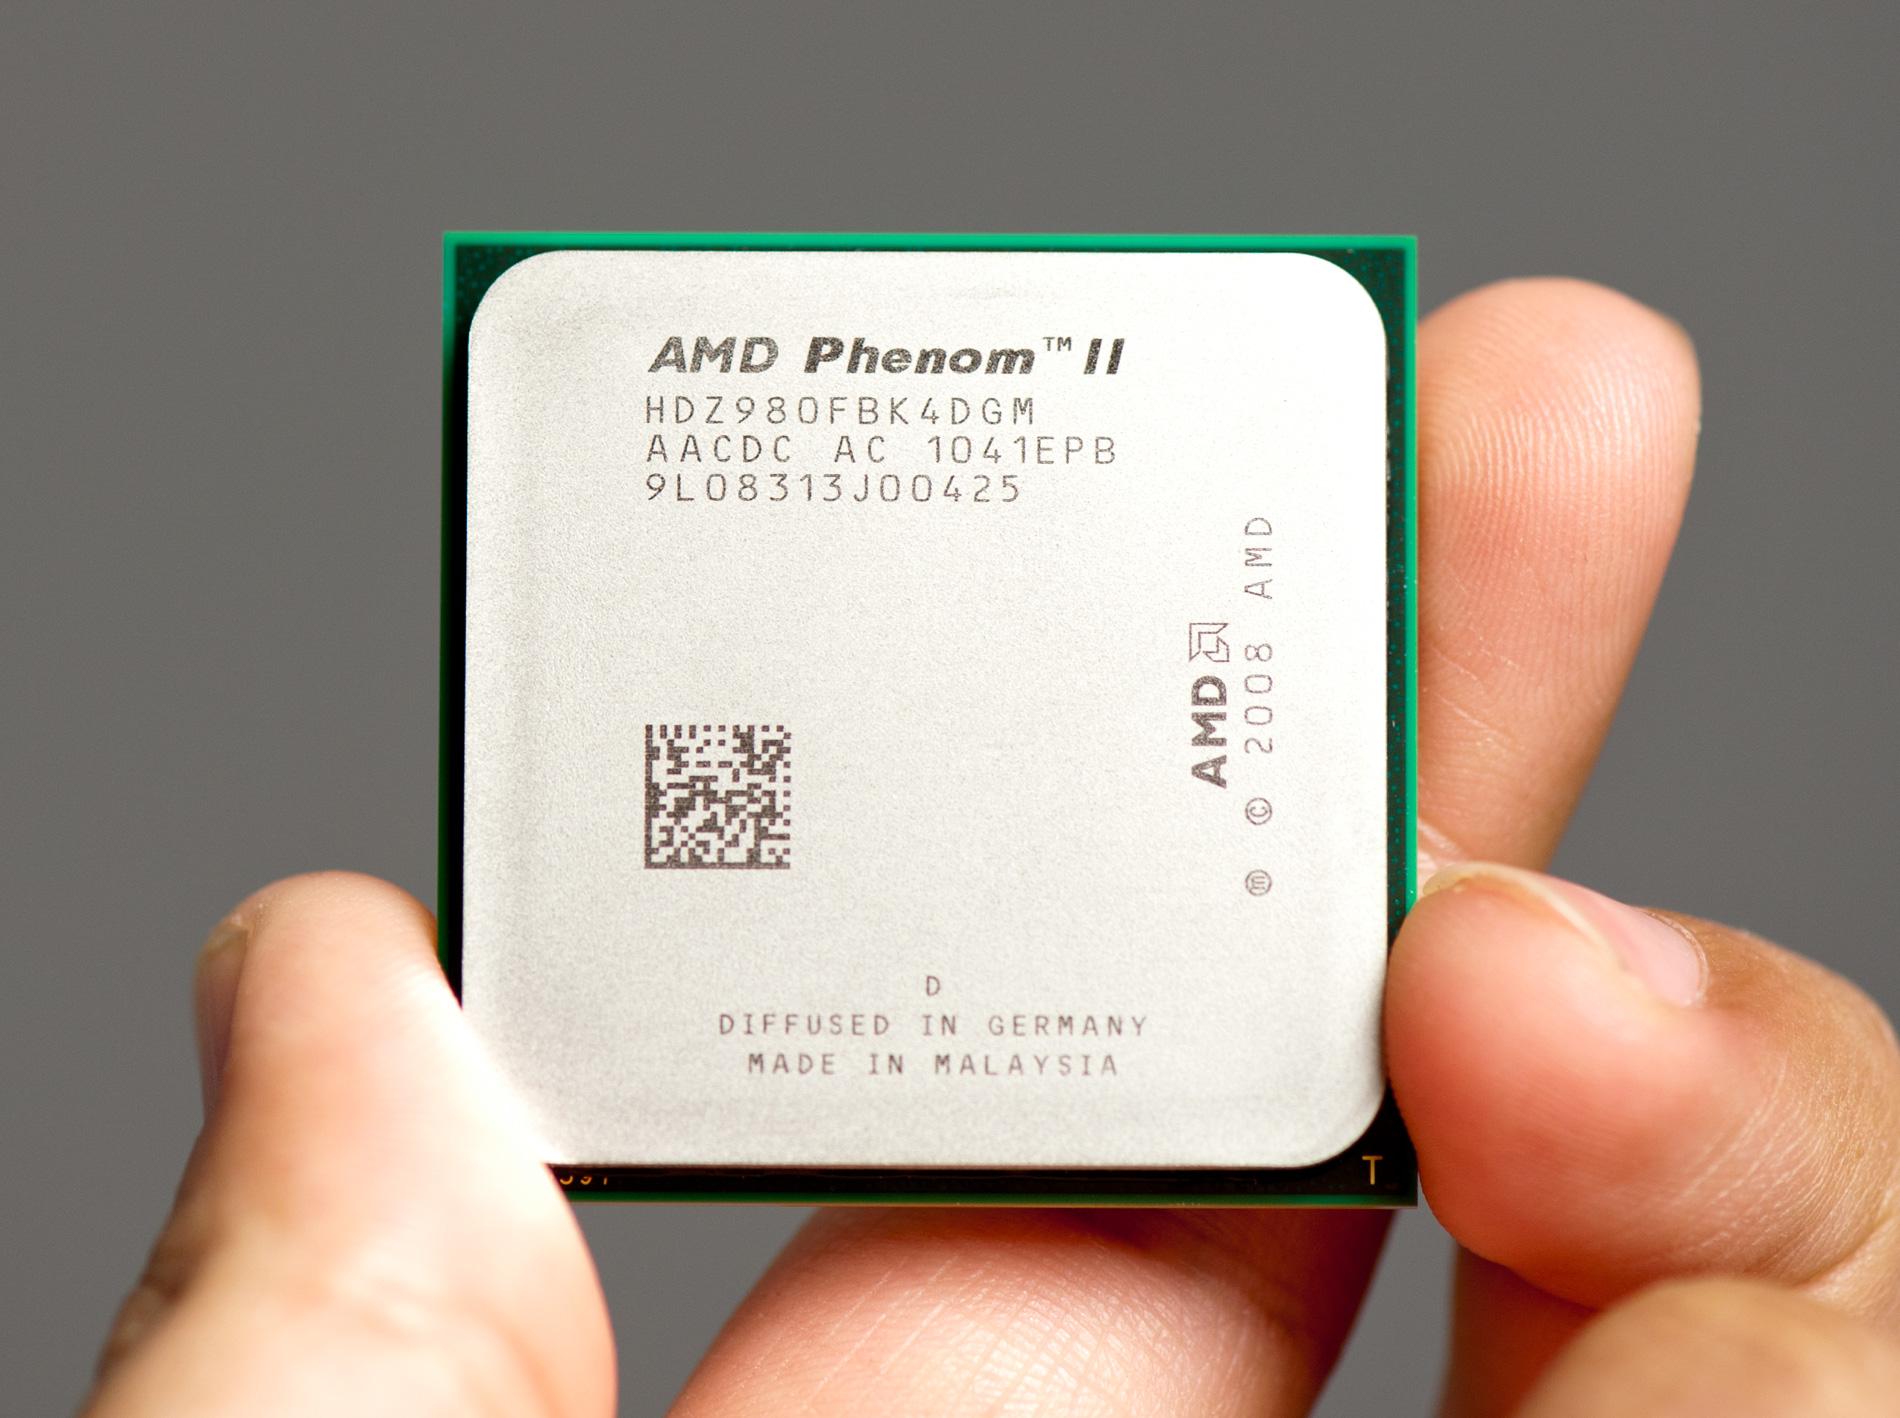 Amd Phenom Ii X4 980 Black Edition Review